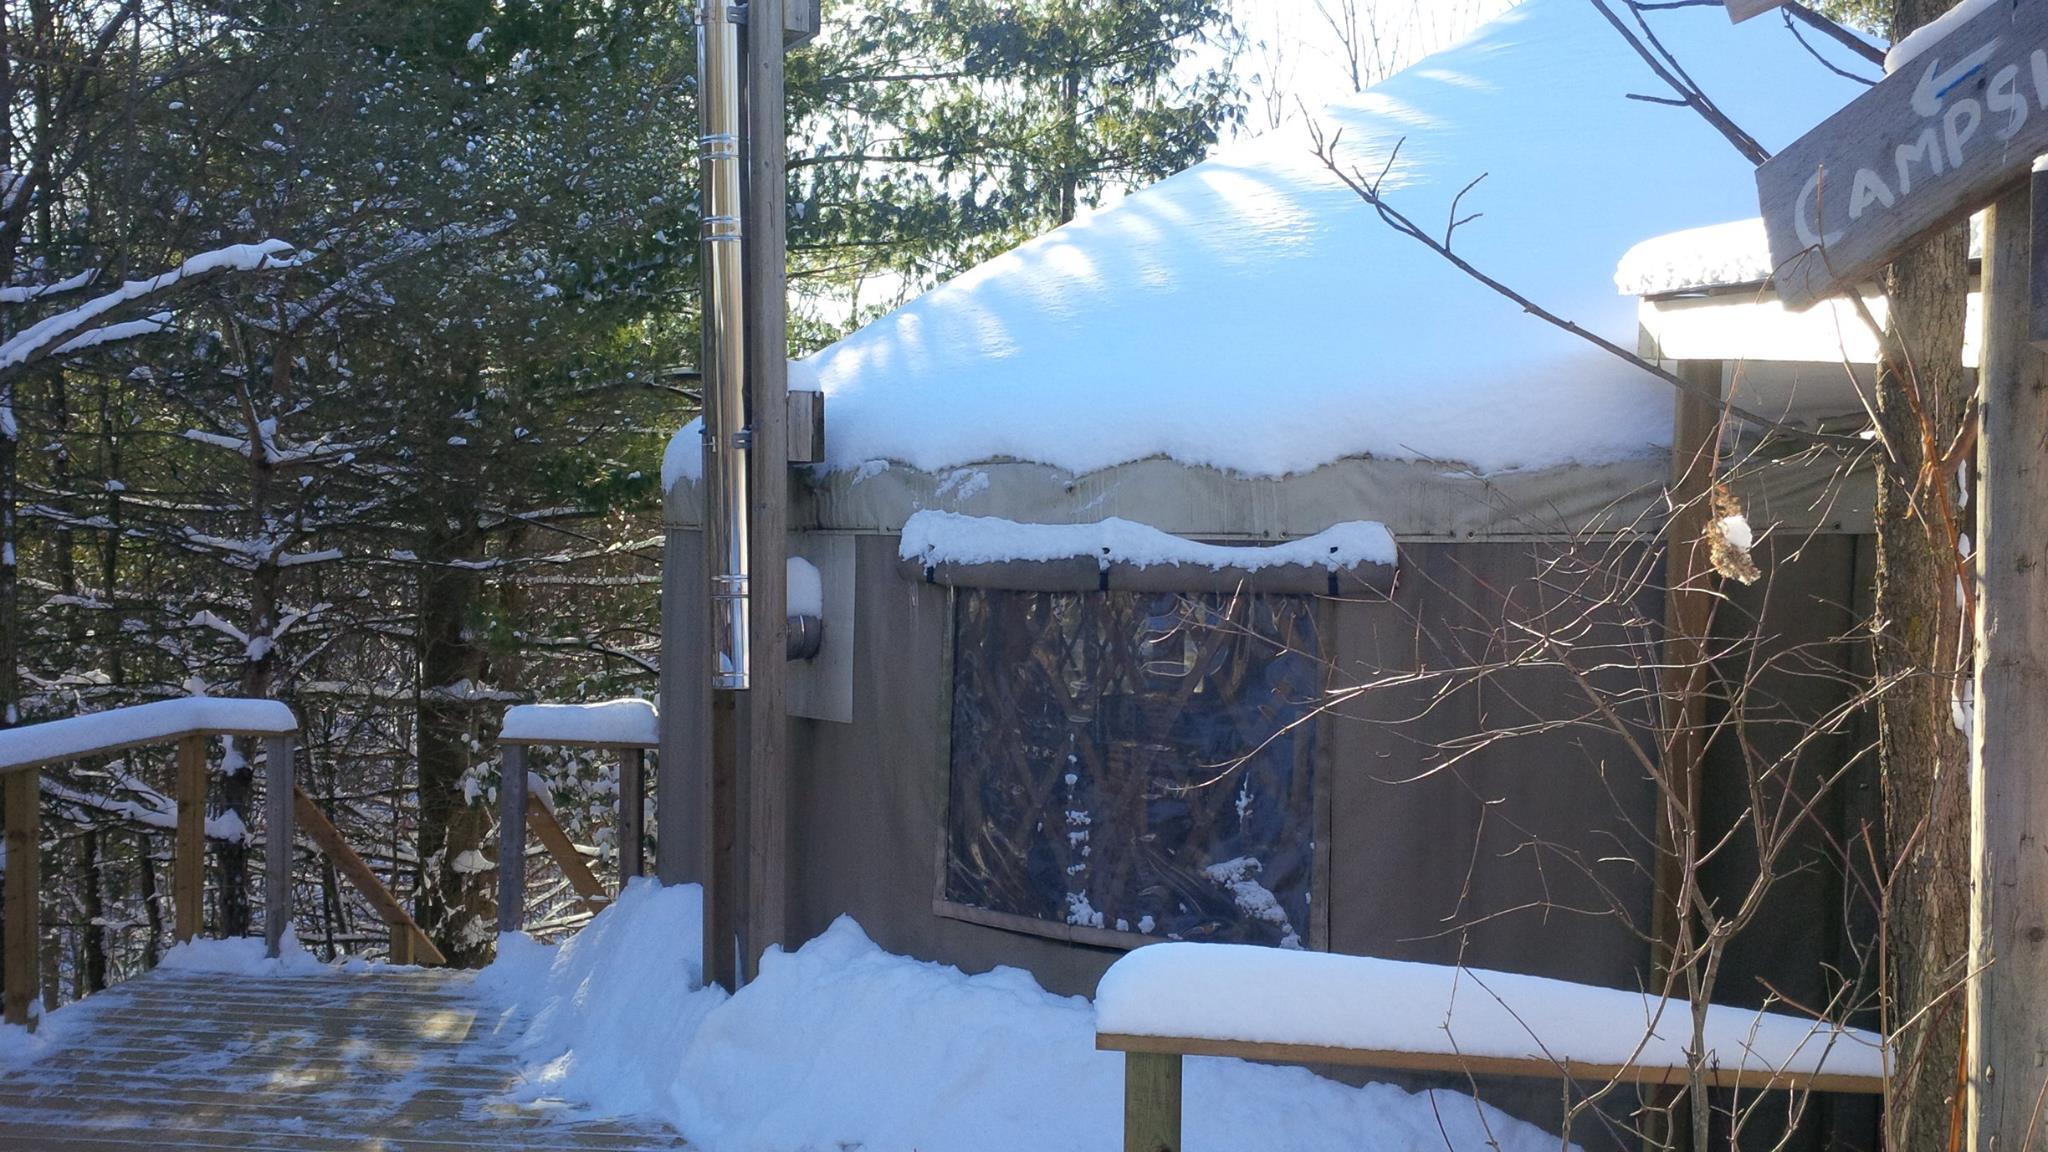 The LUNA Project in Winter